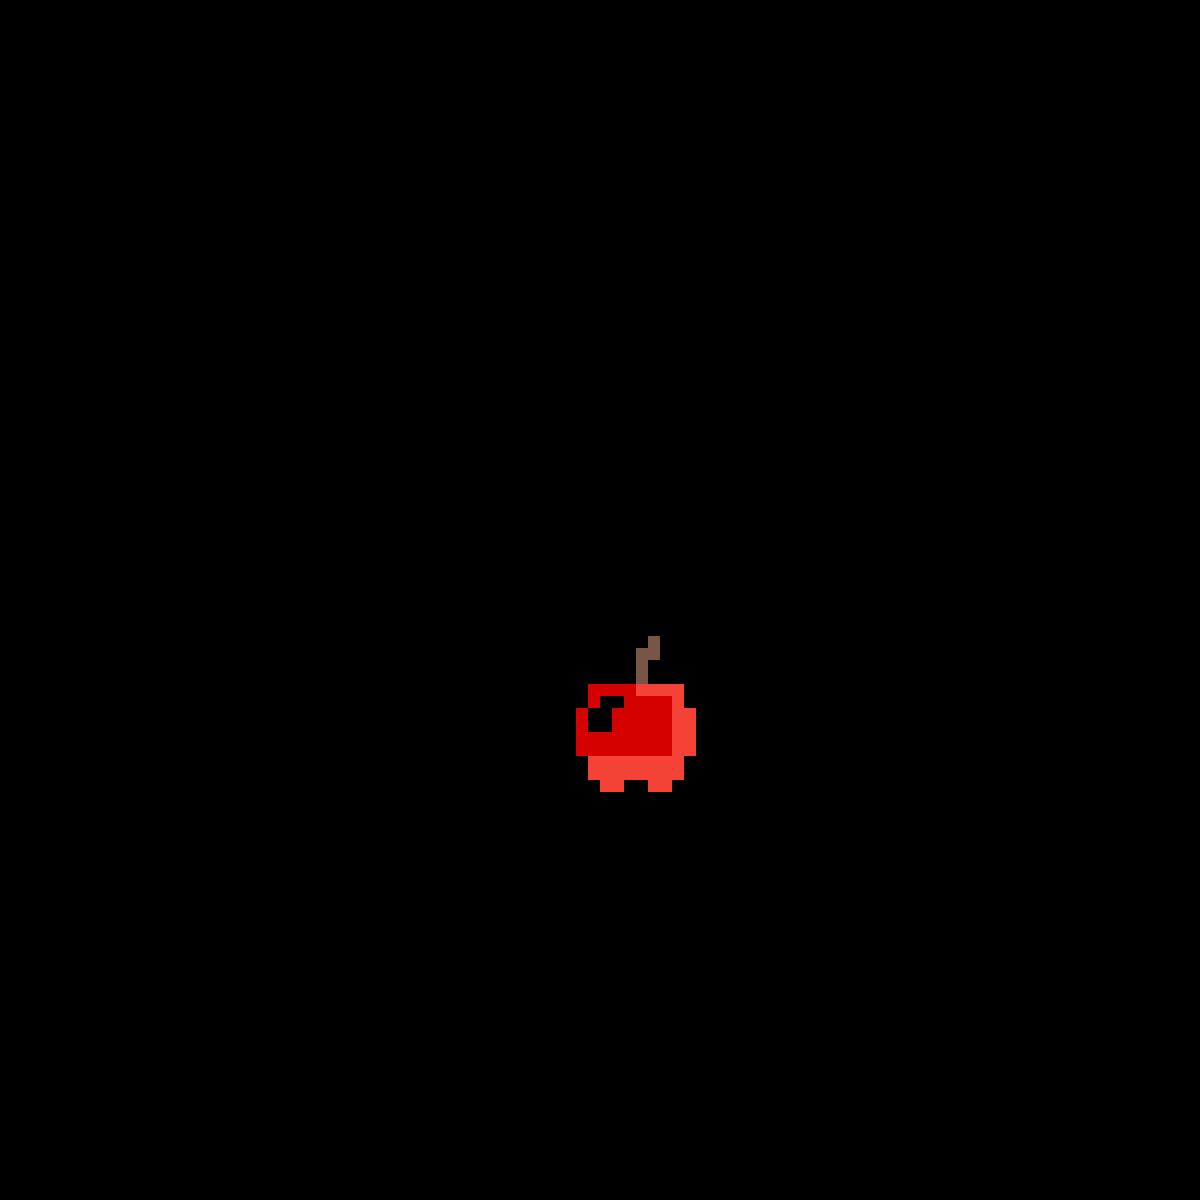 Apple by Abigael